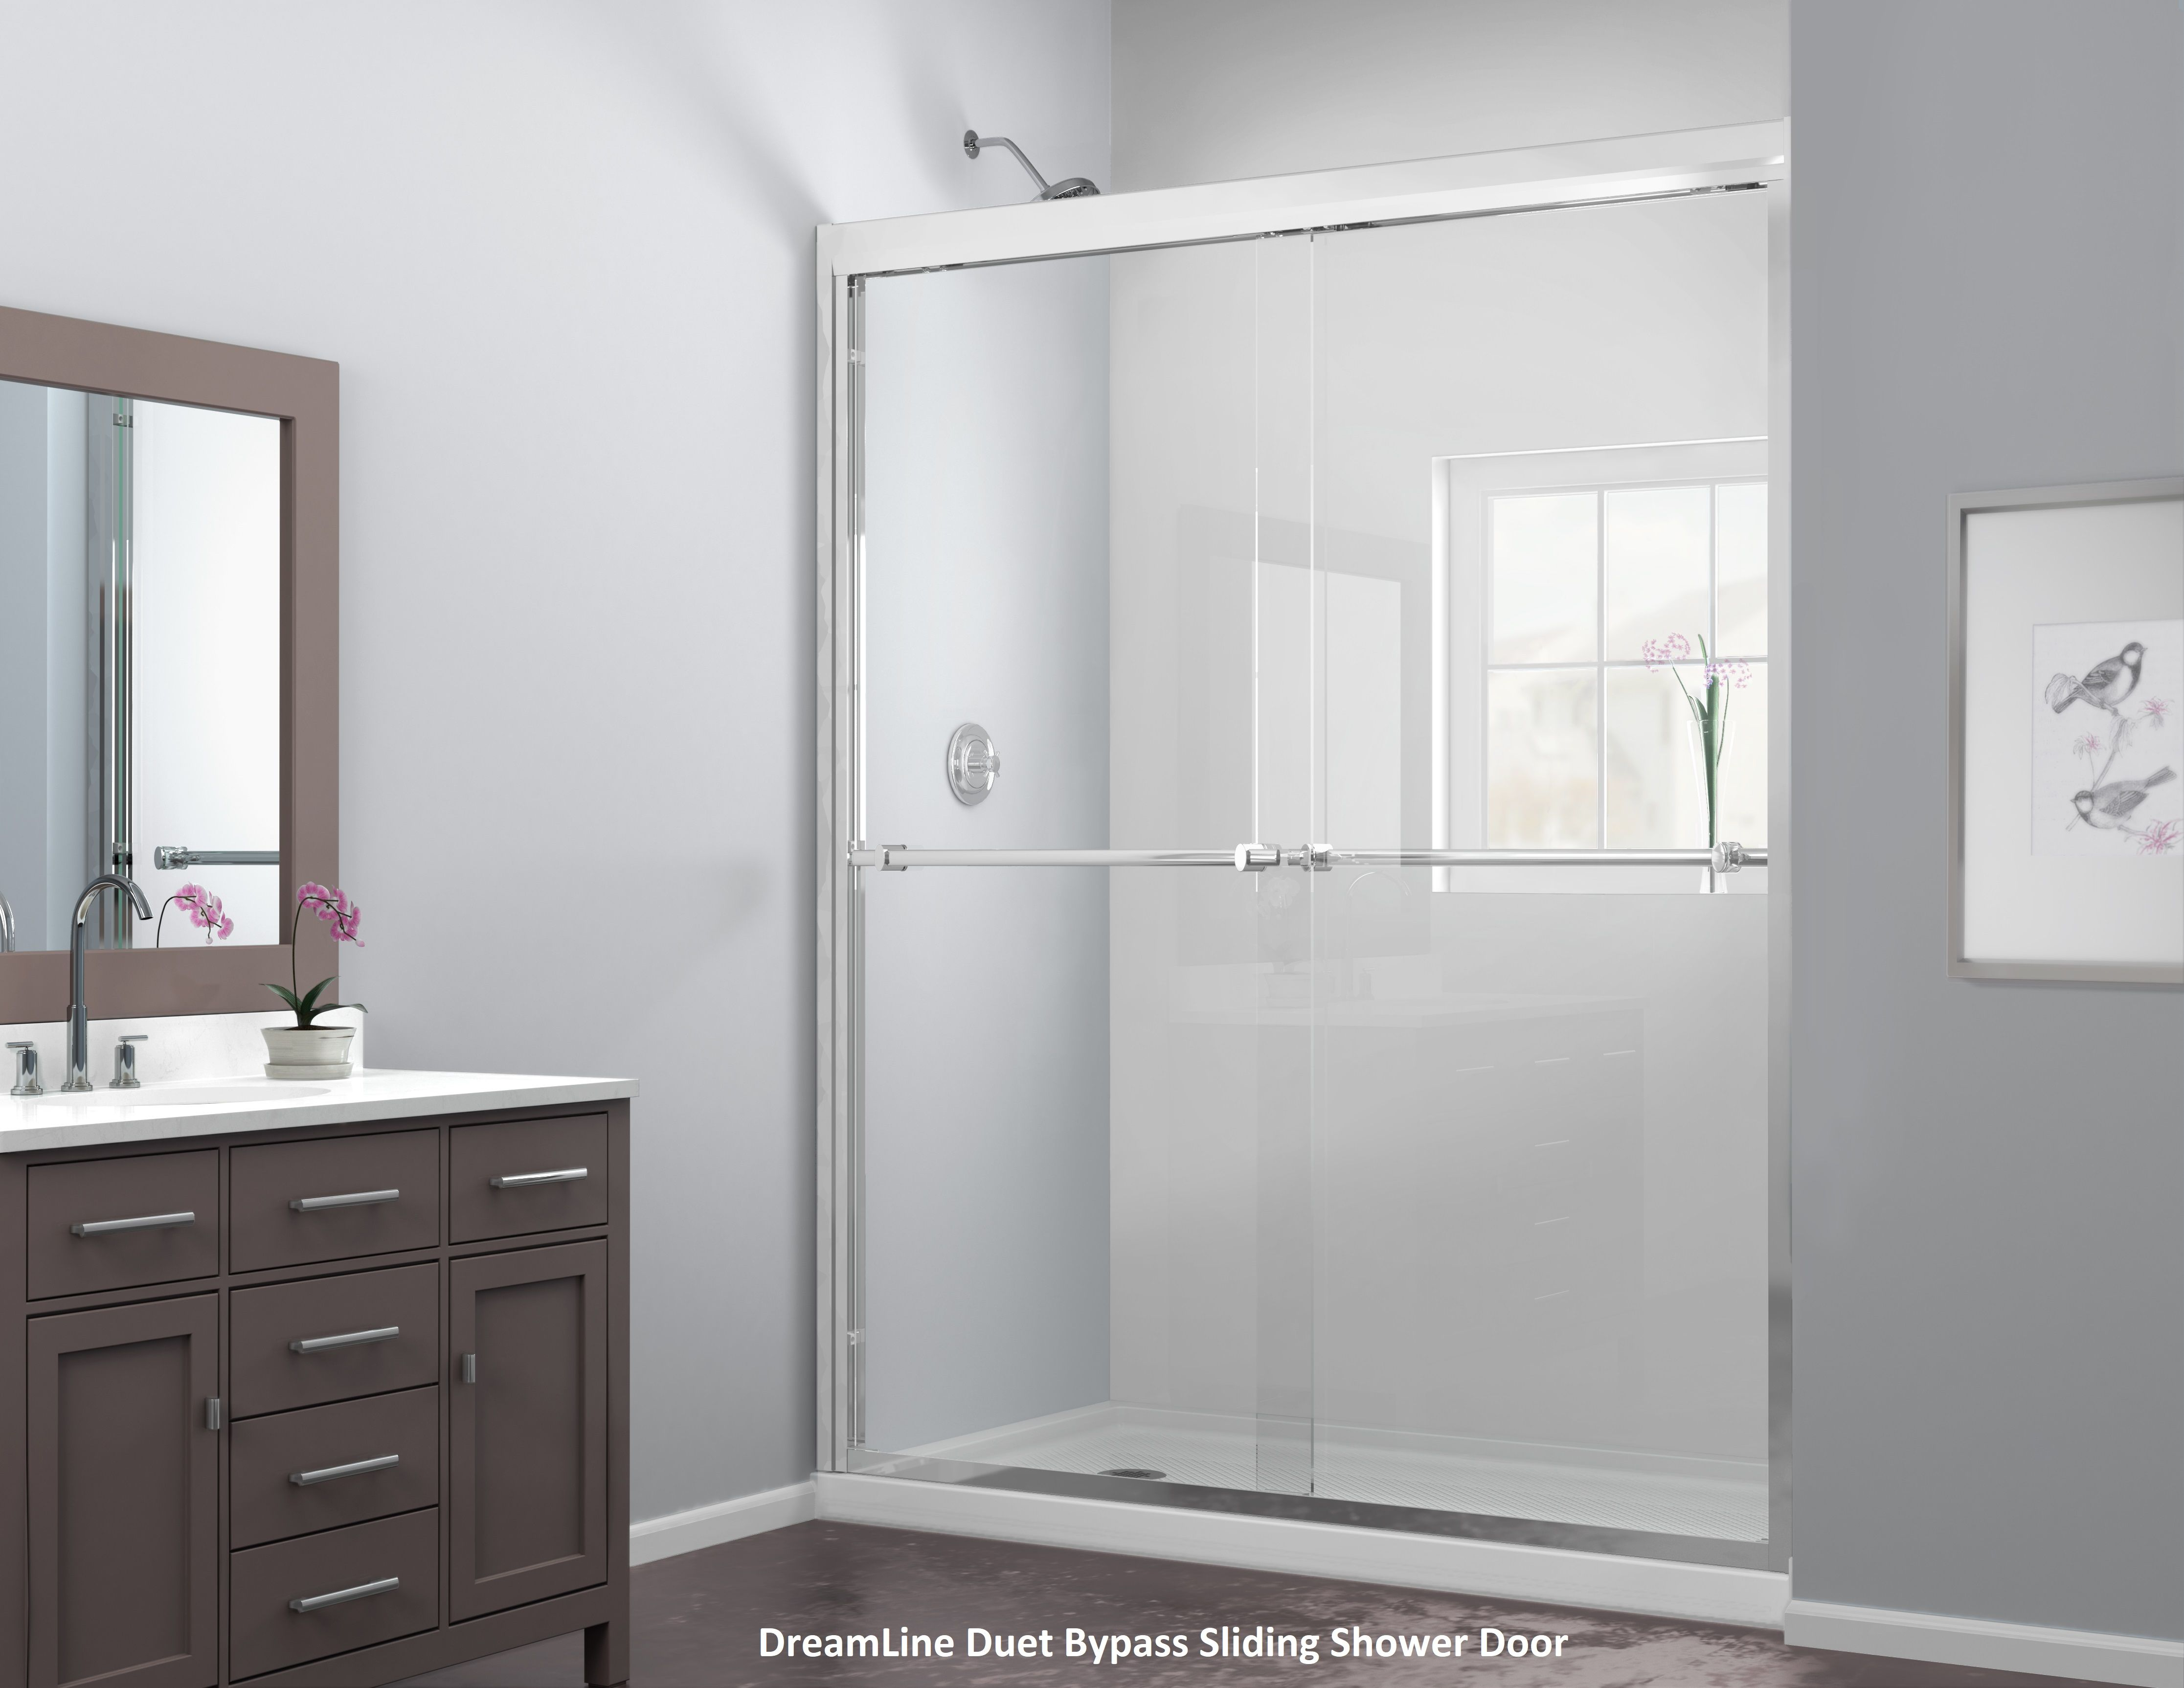 You Deserve It Your Bathroom Oasis Shower Doors Bypass Sliding Shower Doors Sliding Shower Door